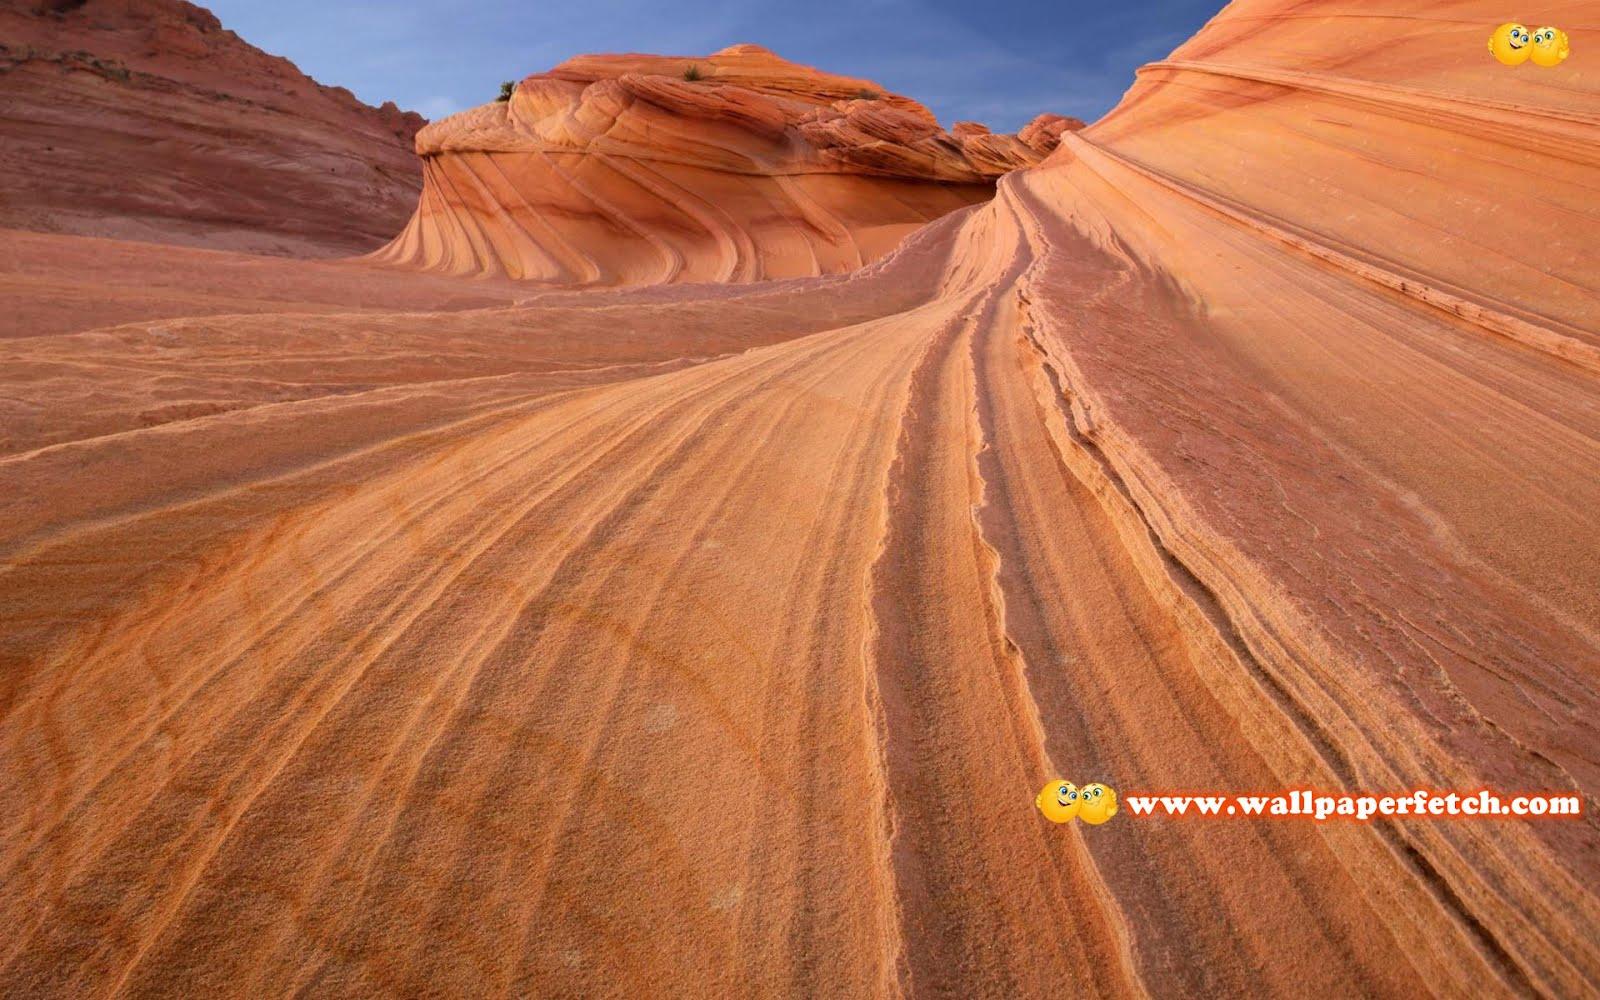 http://4.bp.blogspot.com/-n-nnC7vJhPA/T1ShWTD04bI/AAAAAAAANvA/kctZo7IG8bw/s1600/coyote-buttes-10018-1920x1200.jpg